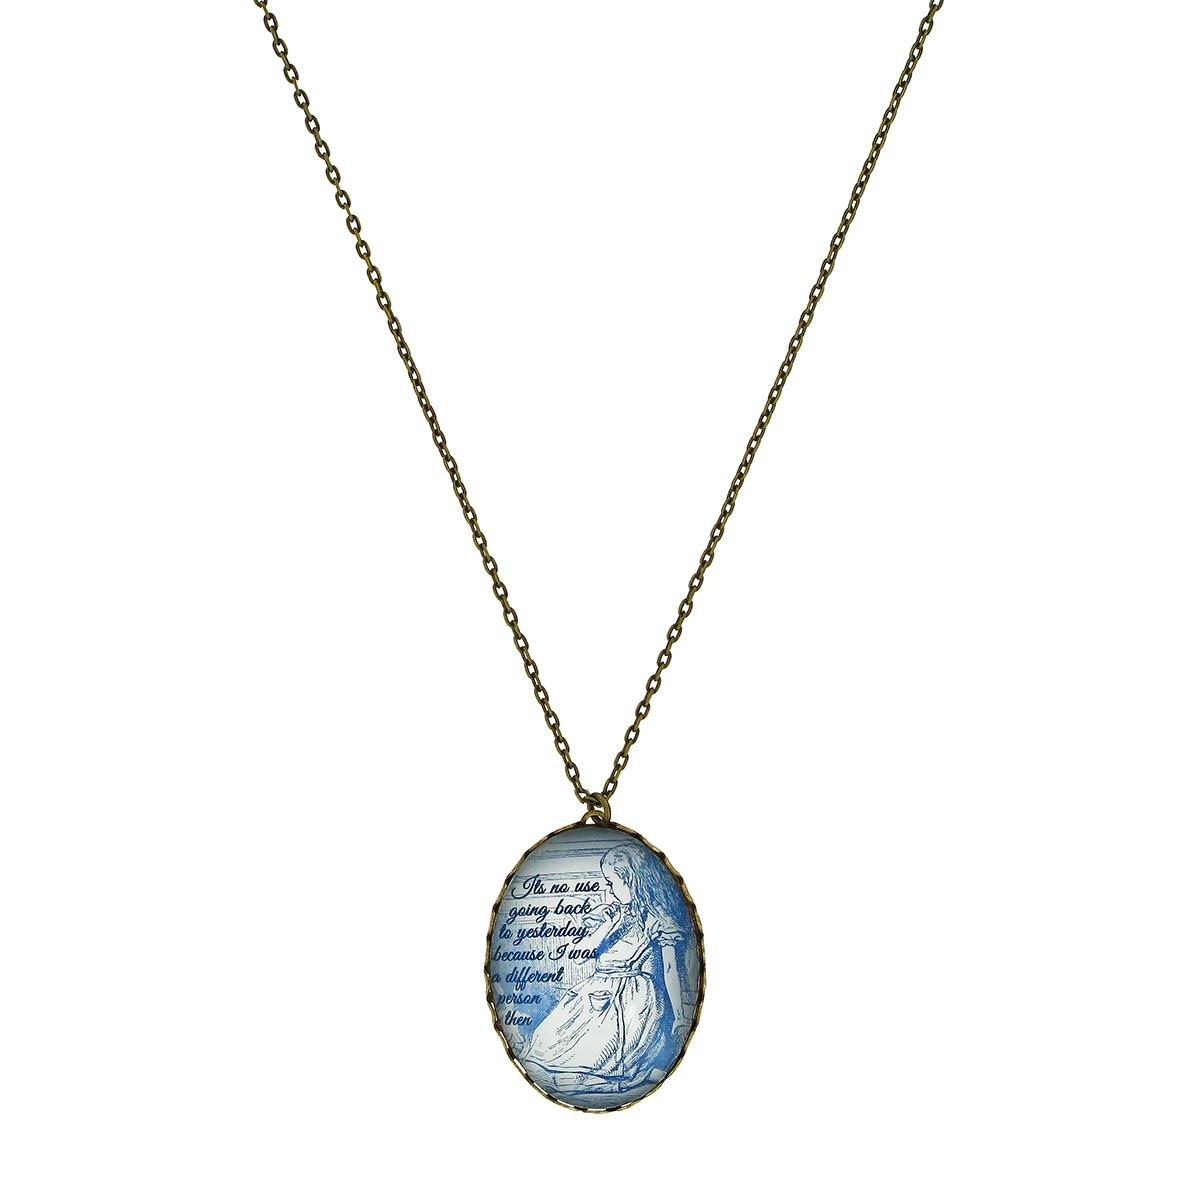 Alice in Wonderland oval necklace